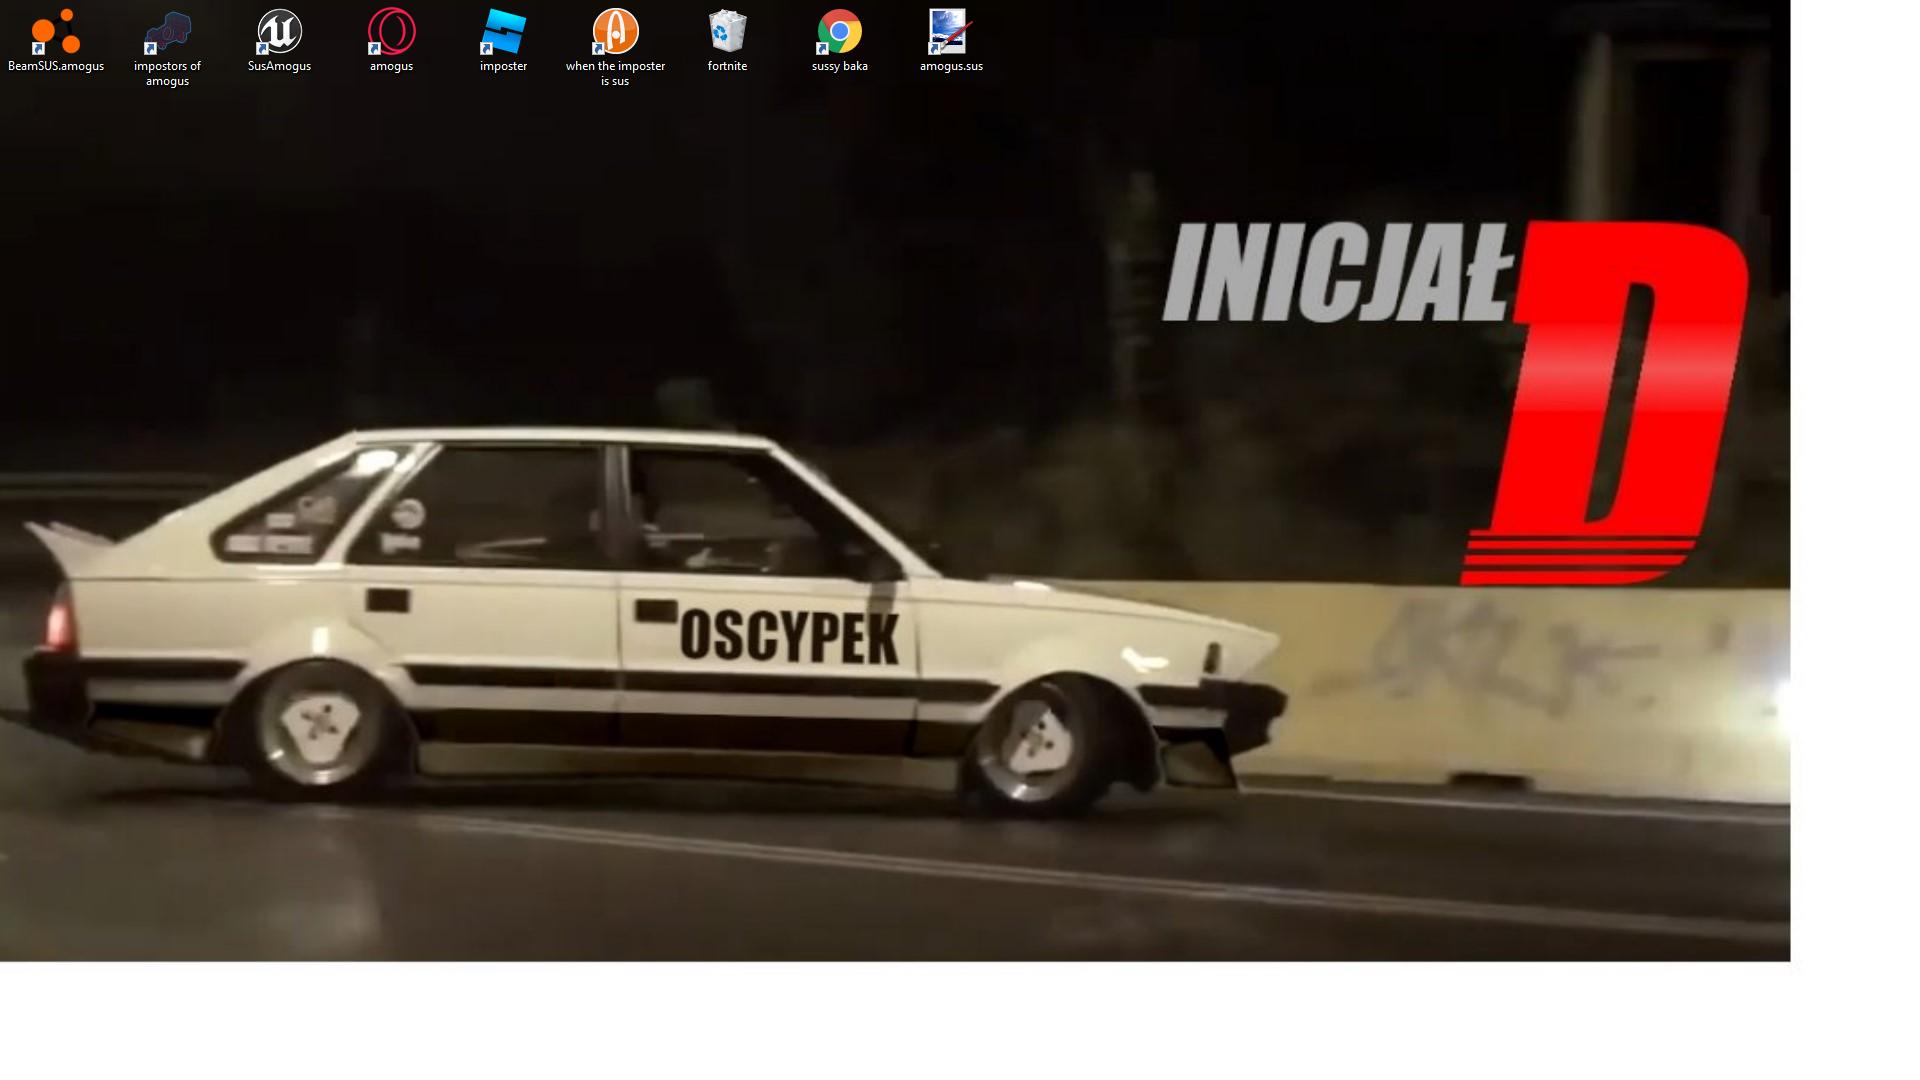 Screenshot 02.07.2021 13_38_45.png